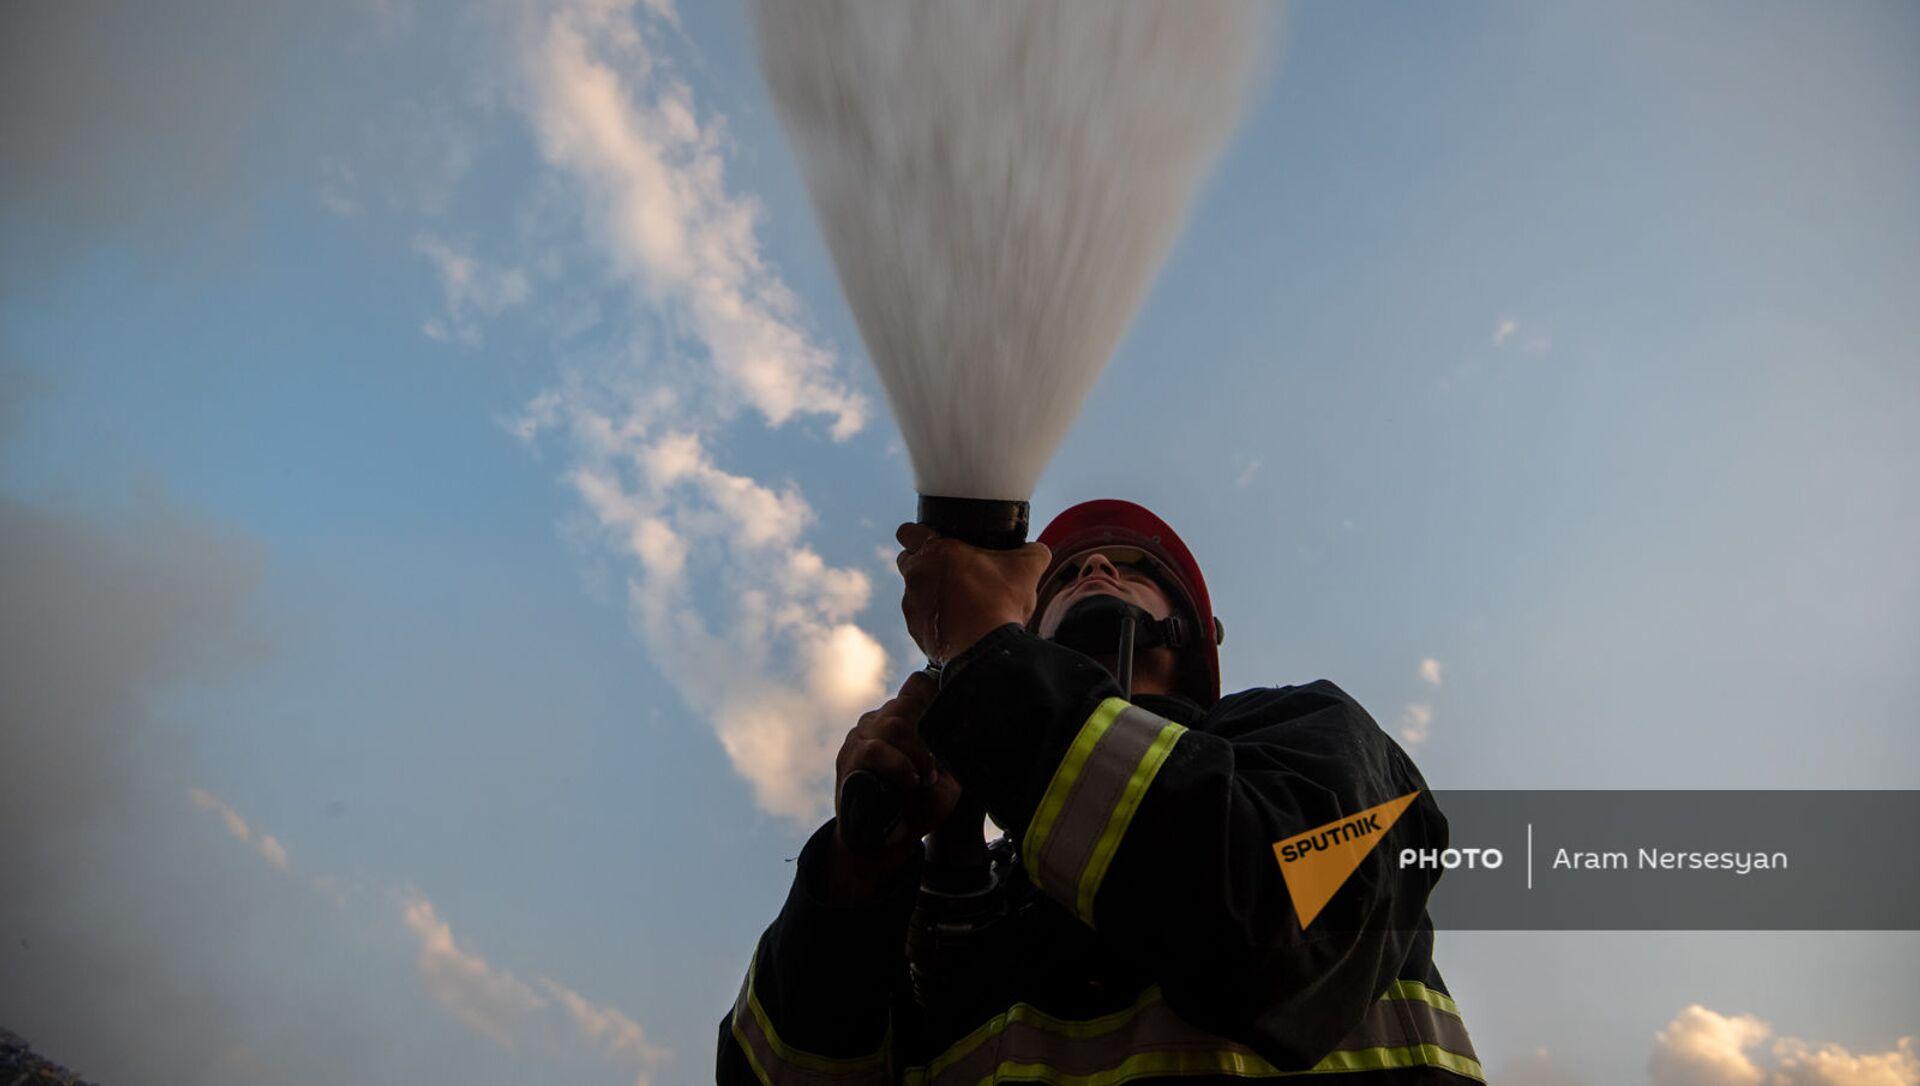 Сотрудник МЧС тушит пожар на свалке в Нубарашене - Sputnik Արմենիա, 1920, 31.08.2021